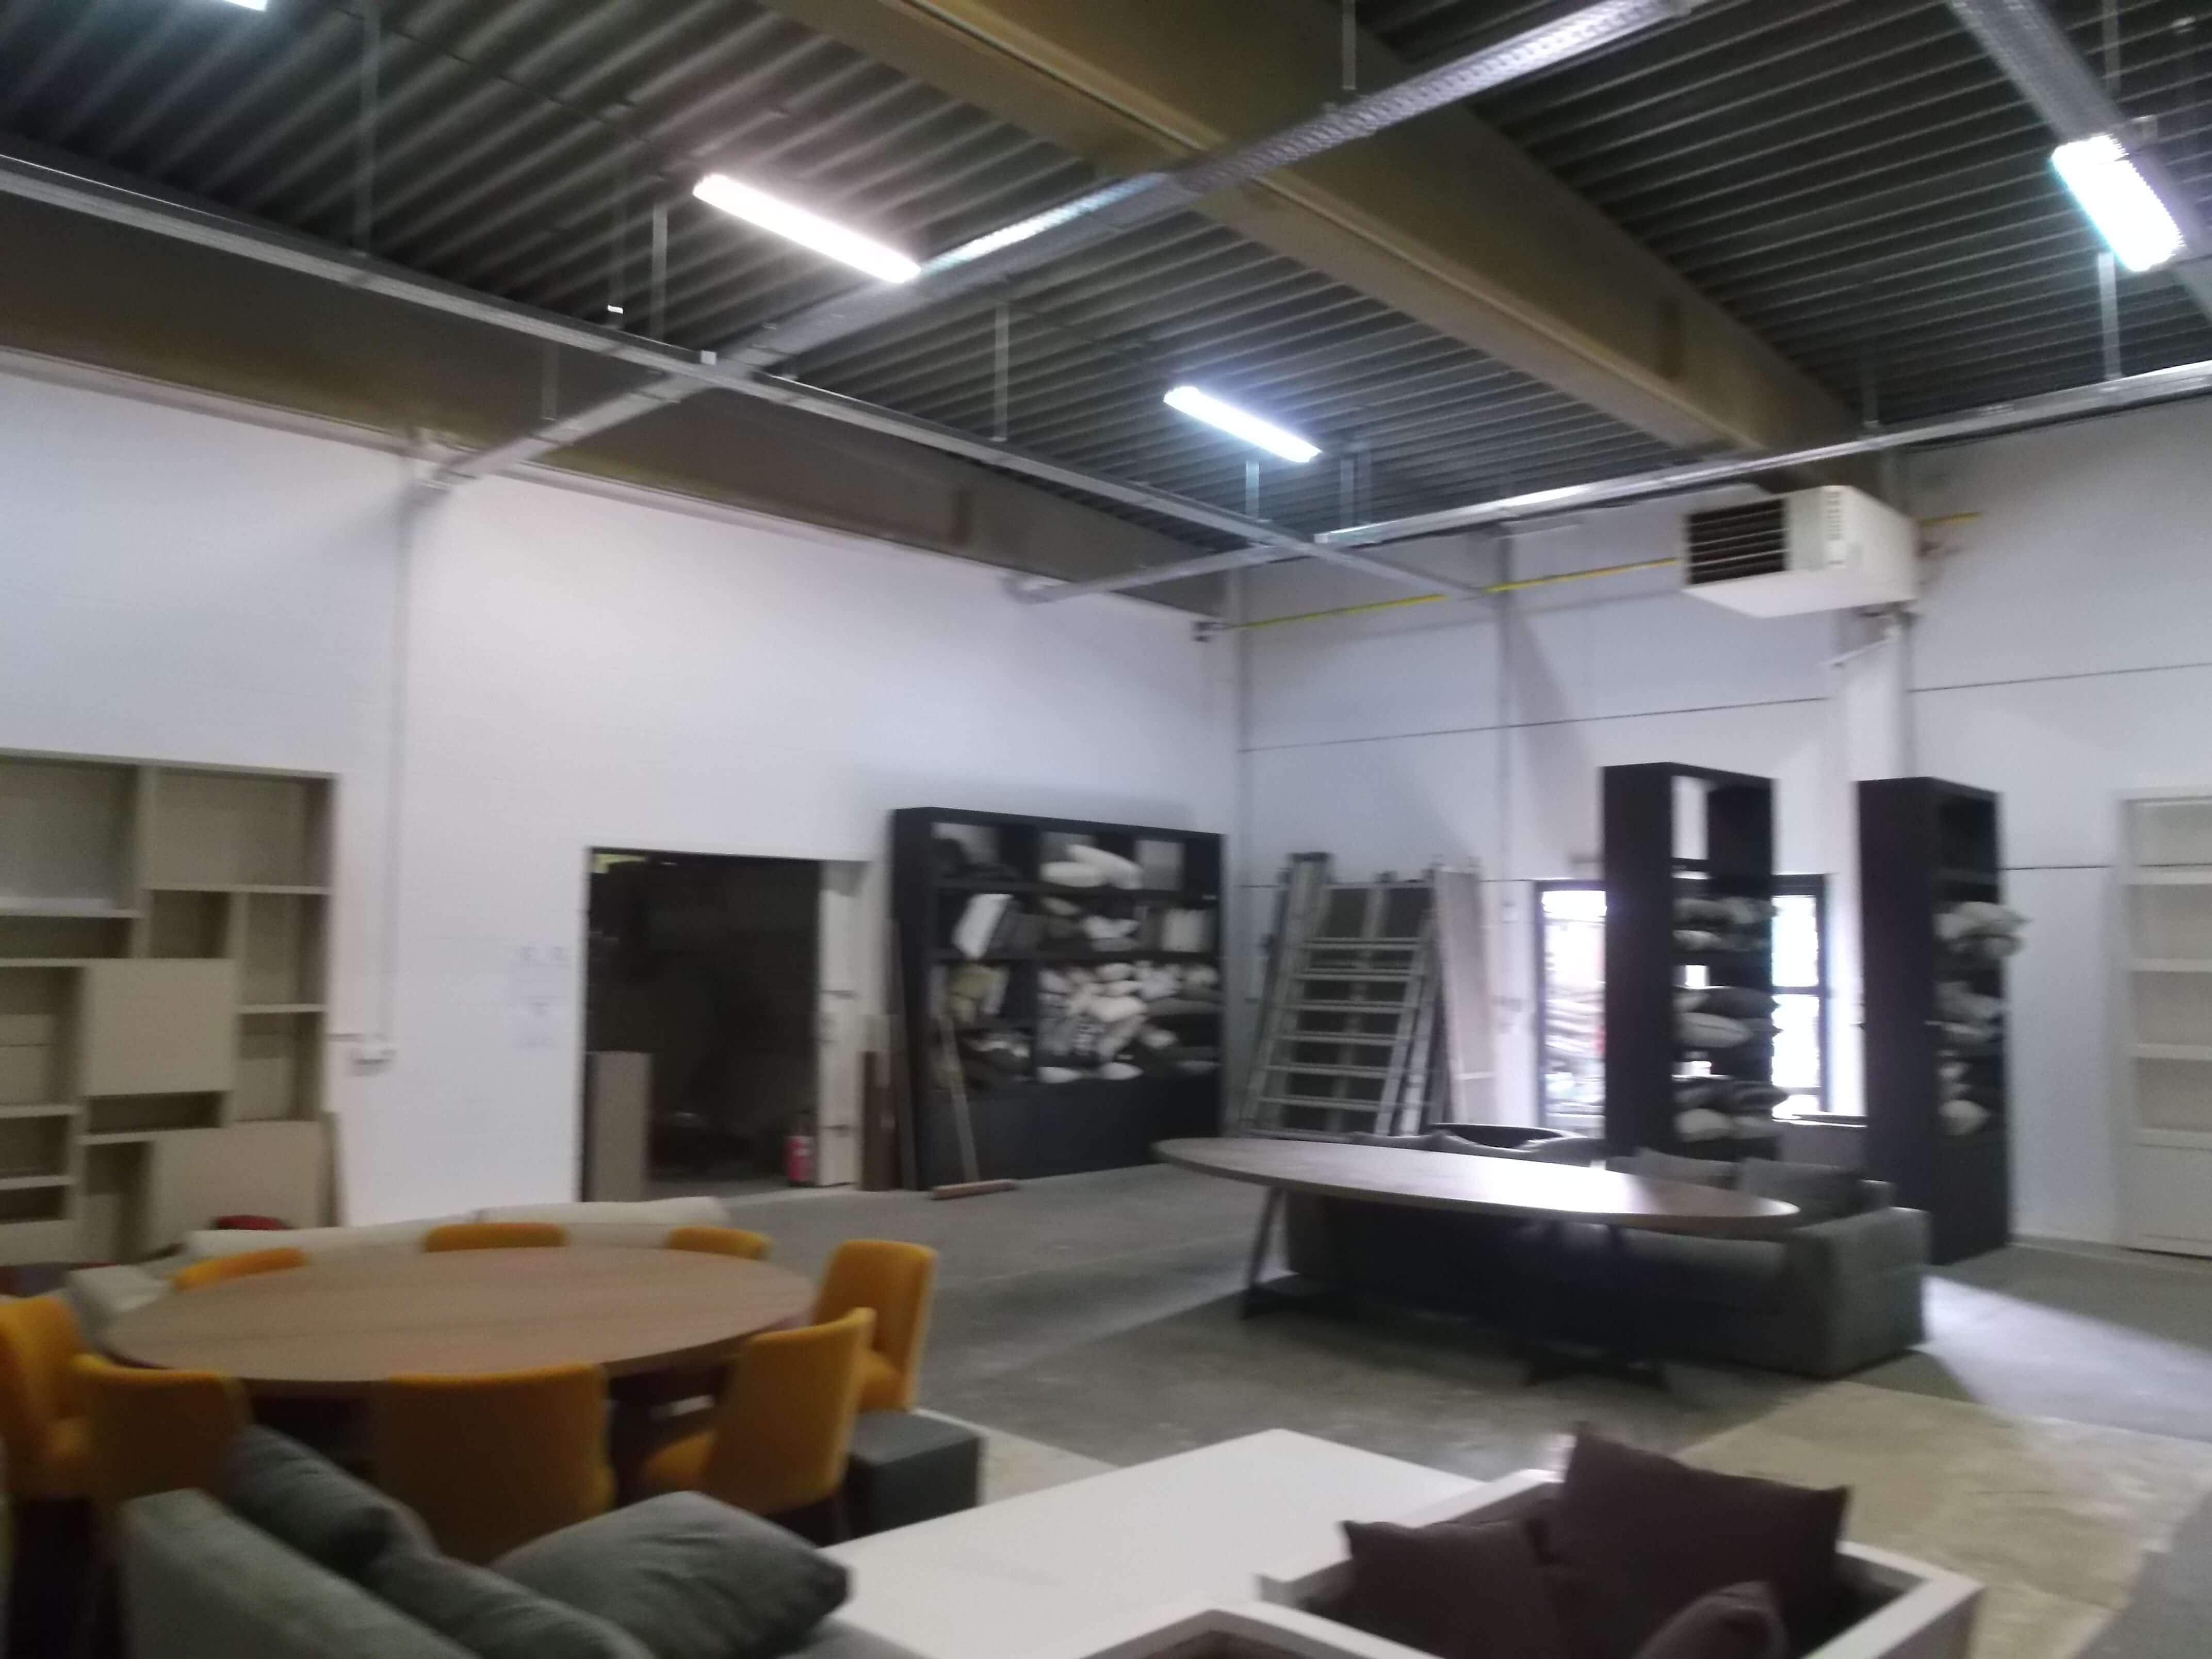 lights-elec-galerie-electricite-vanhoyesprl